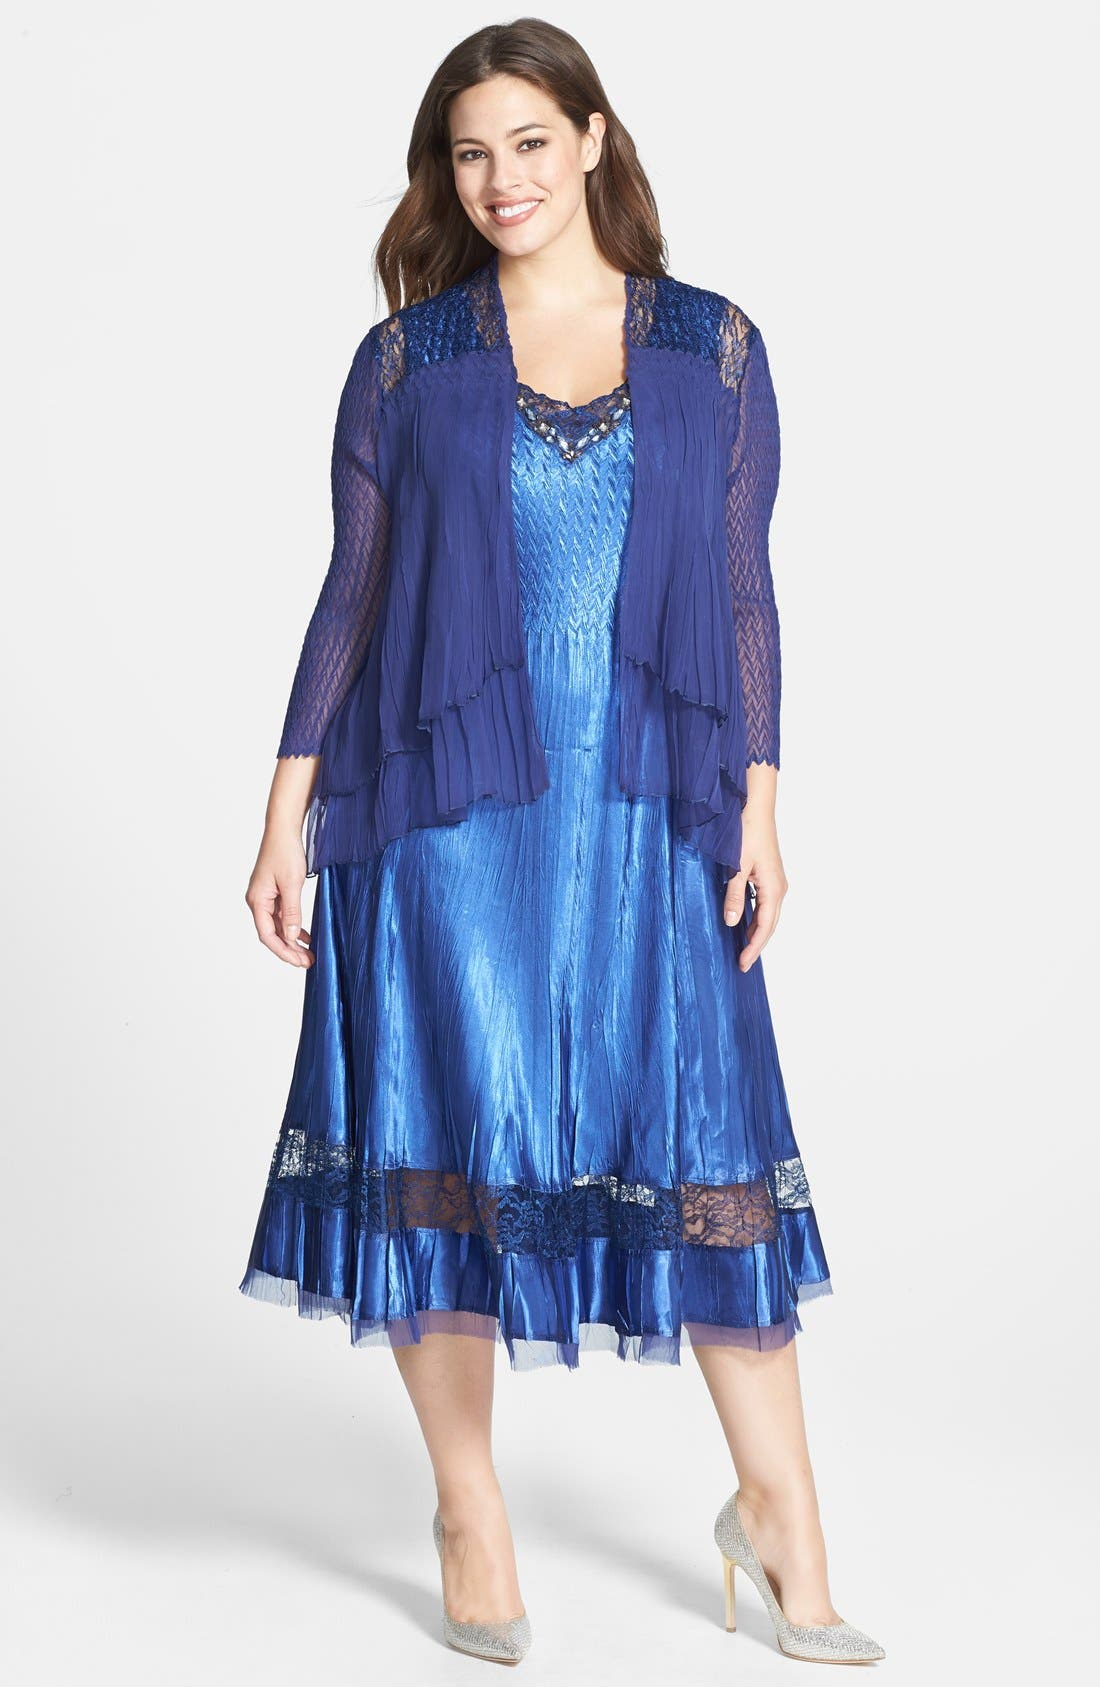 Main Image - Komarov Charmeuse Dress & Chiffon Jacket (Plus Size)